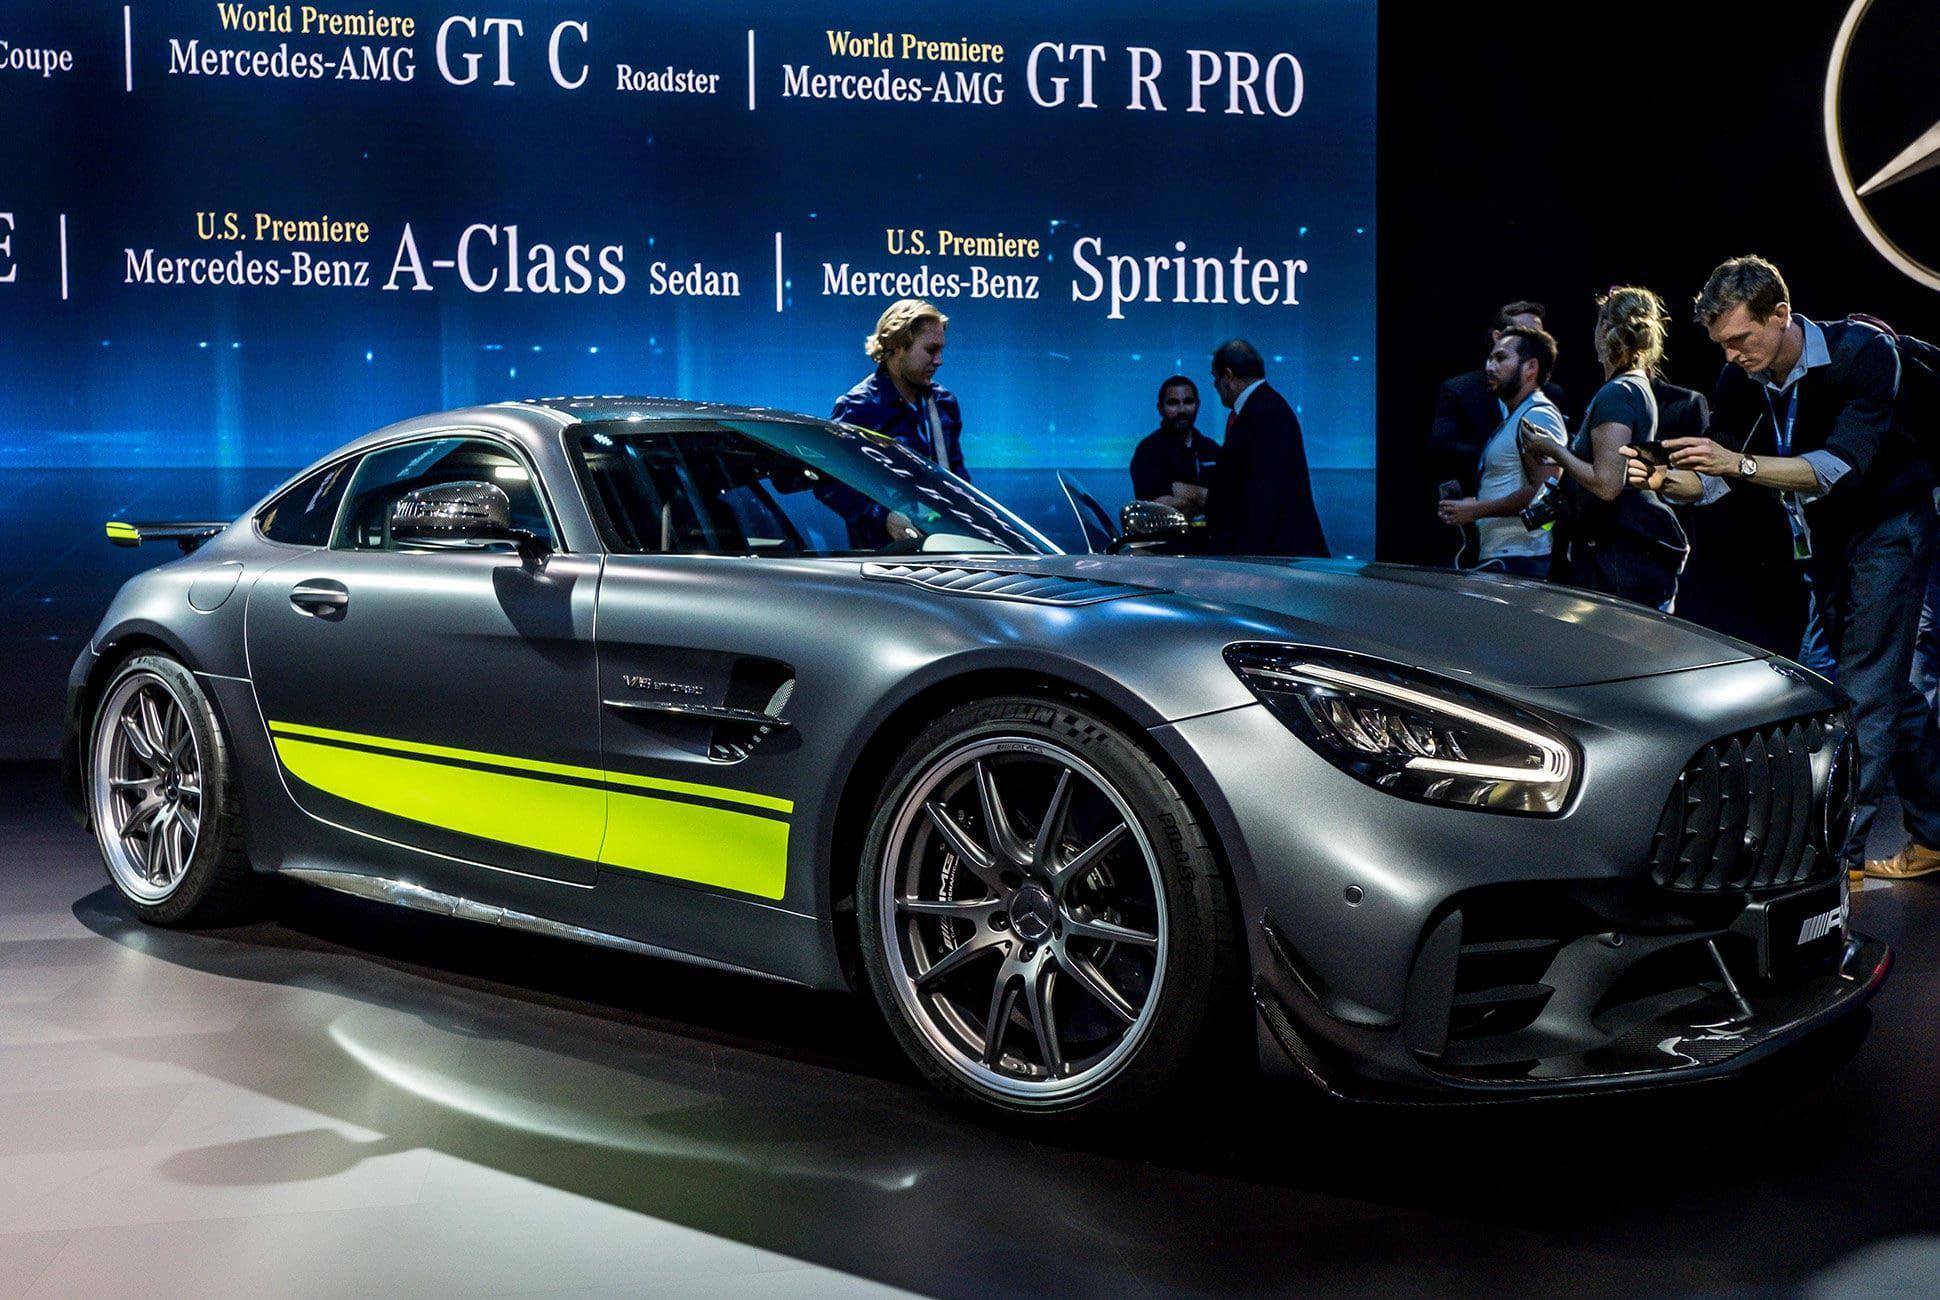 Top 10 La Auto Show Cars Gear Patrol Amg Gtr Pro Slide 1